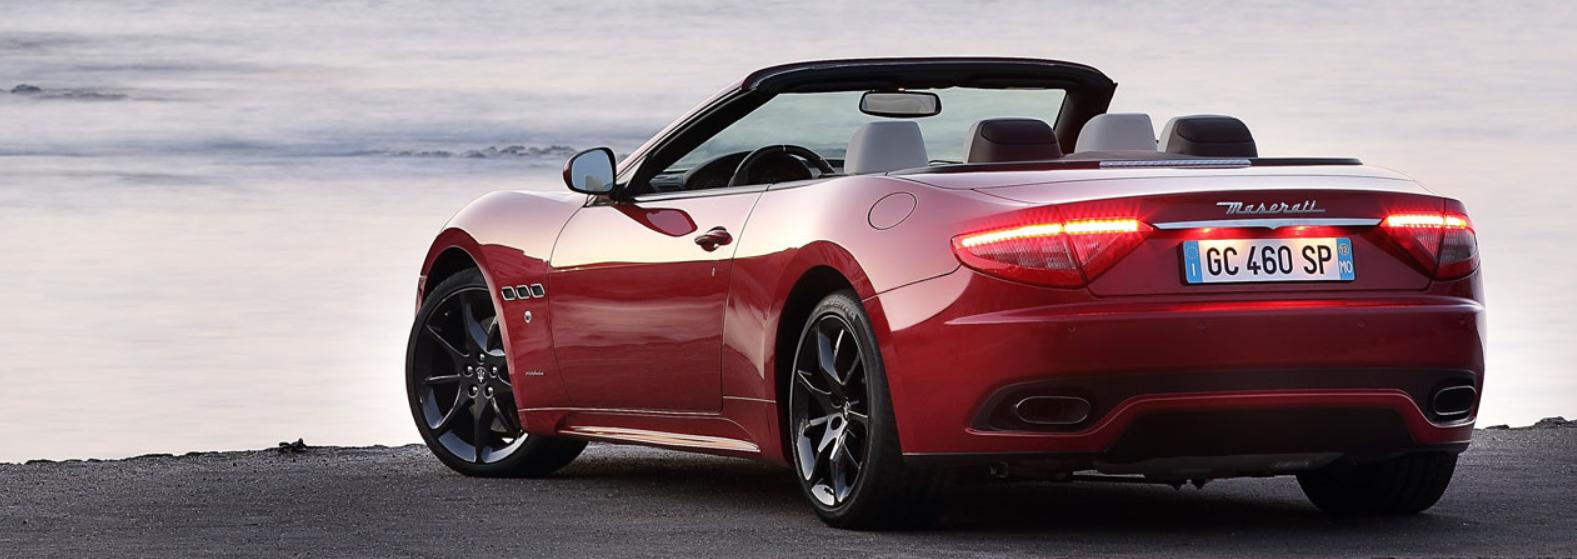 Maserati_Gran_Cabrio_Sport-ด้านหลัง